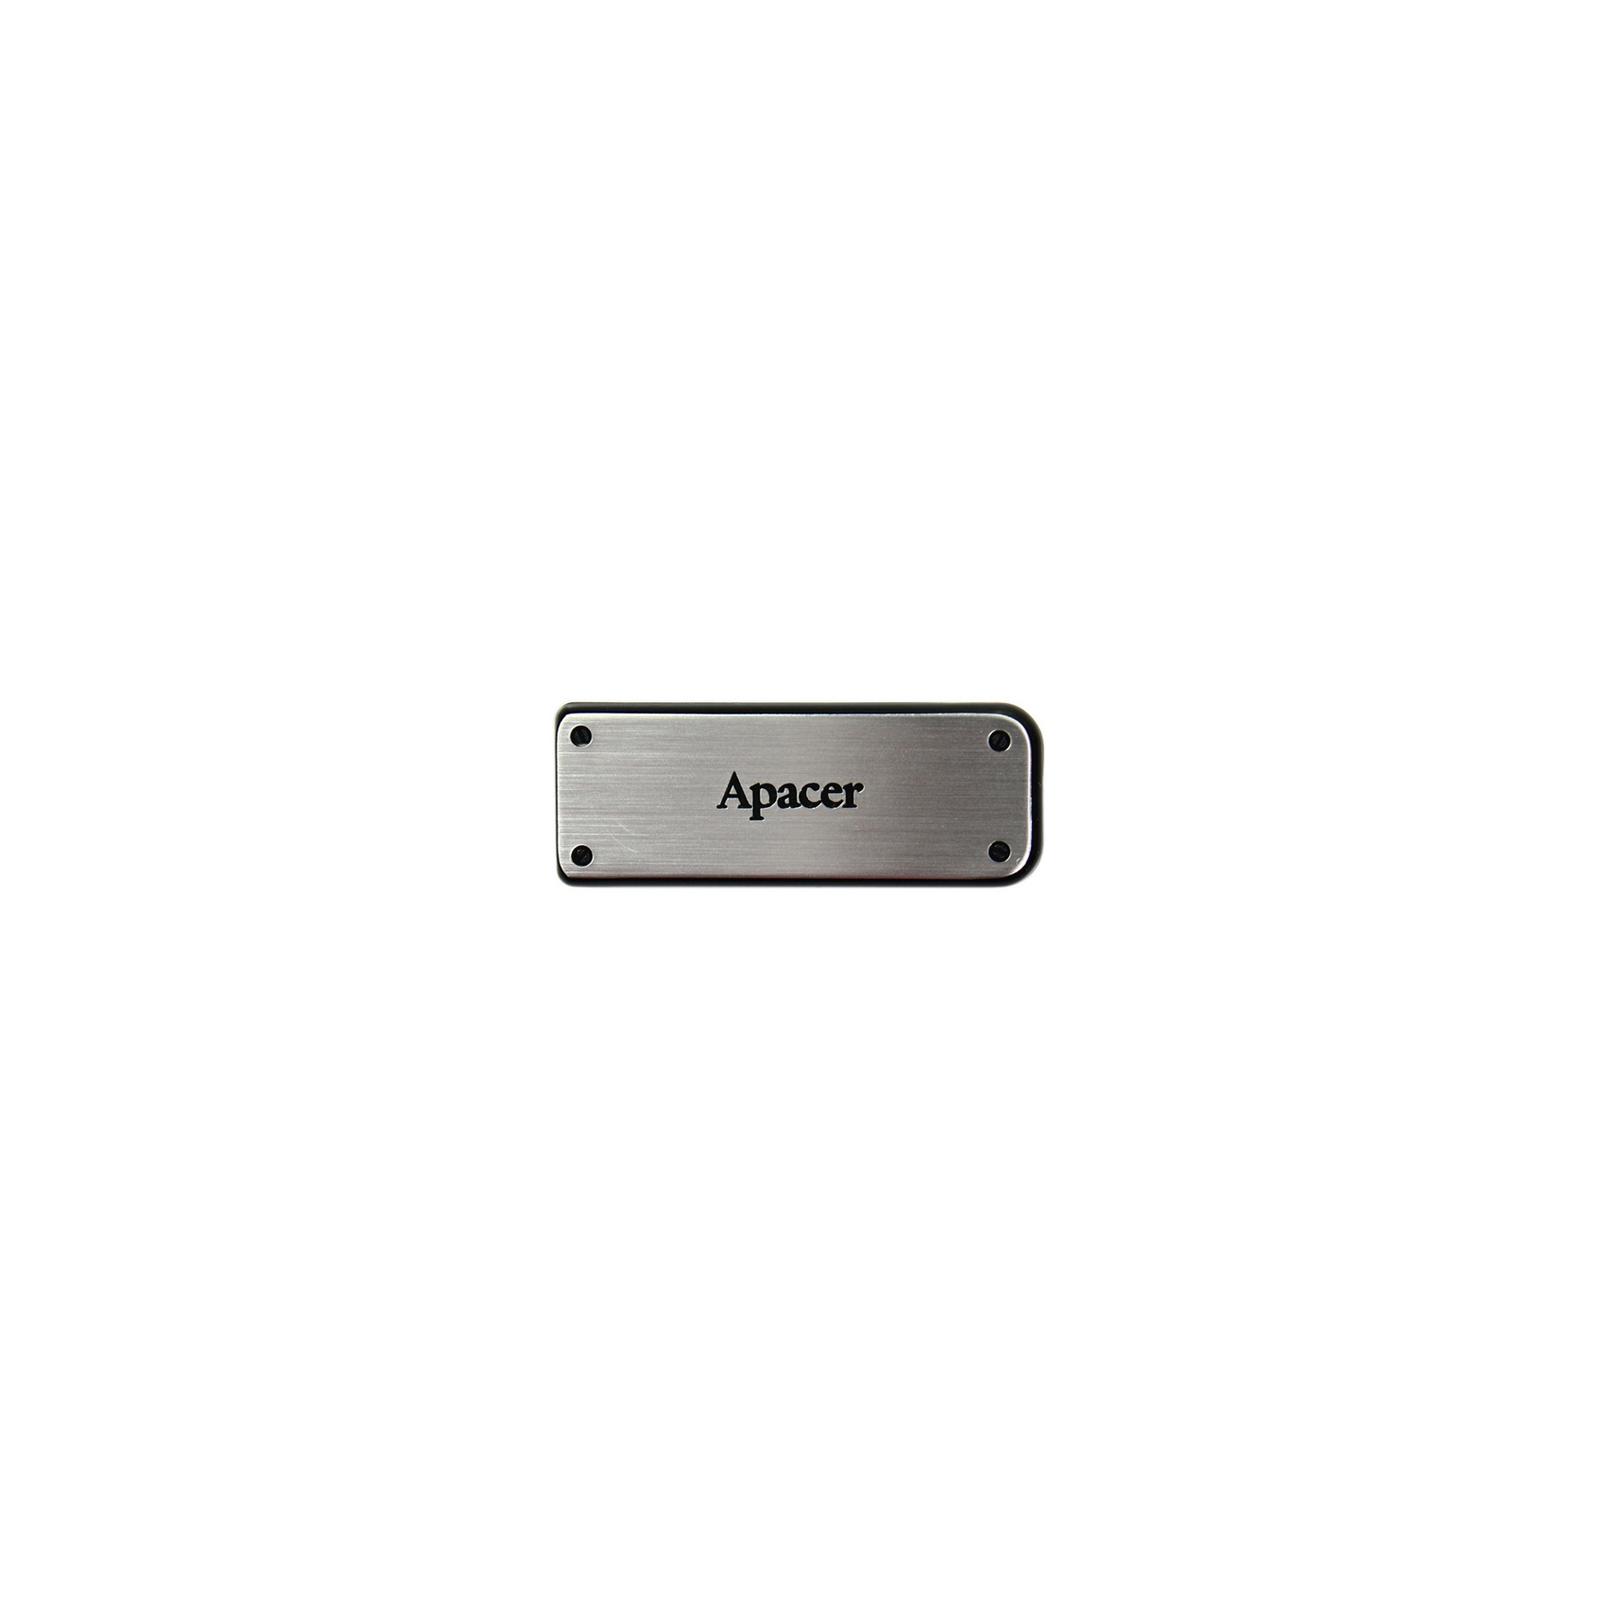 USB флеш накопитель 32GB AH328 Silver RP USB2.0 Apacer (AP32GAH328S-1)